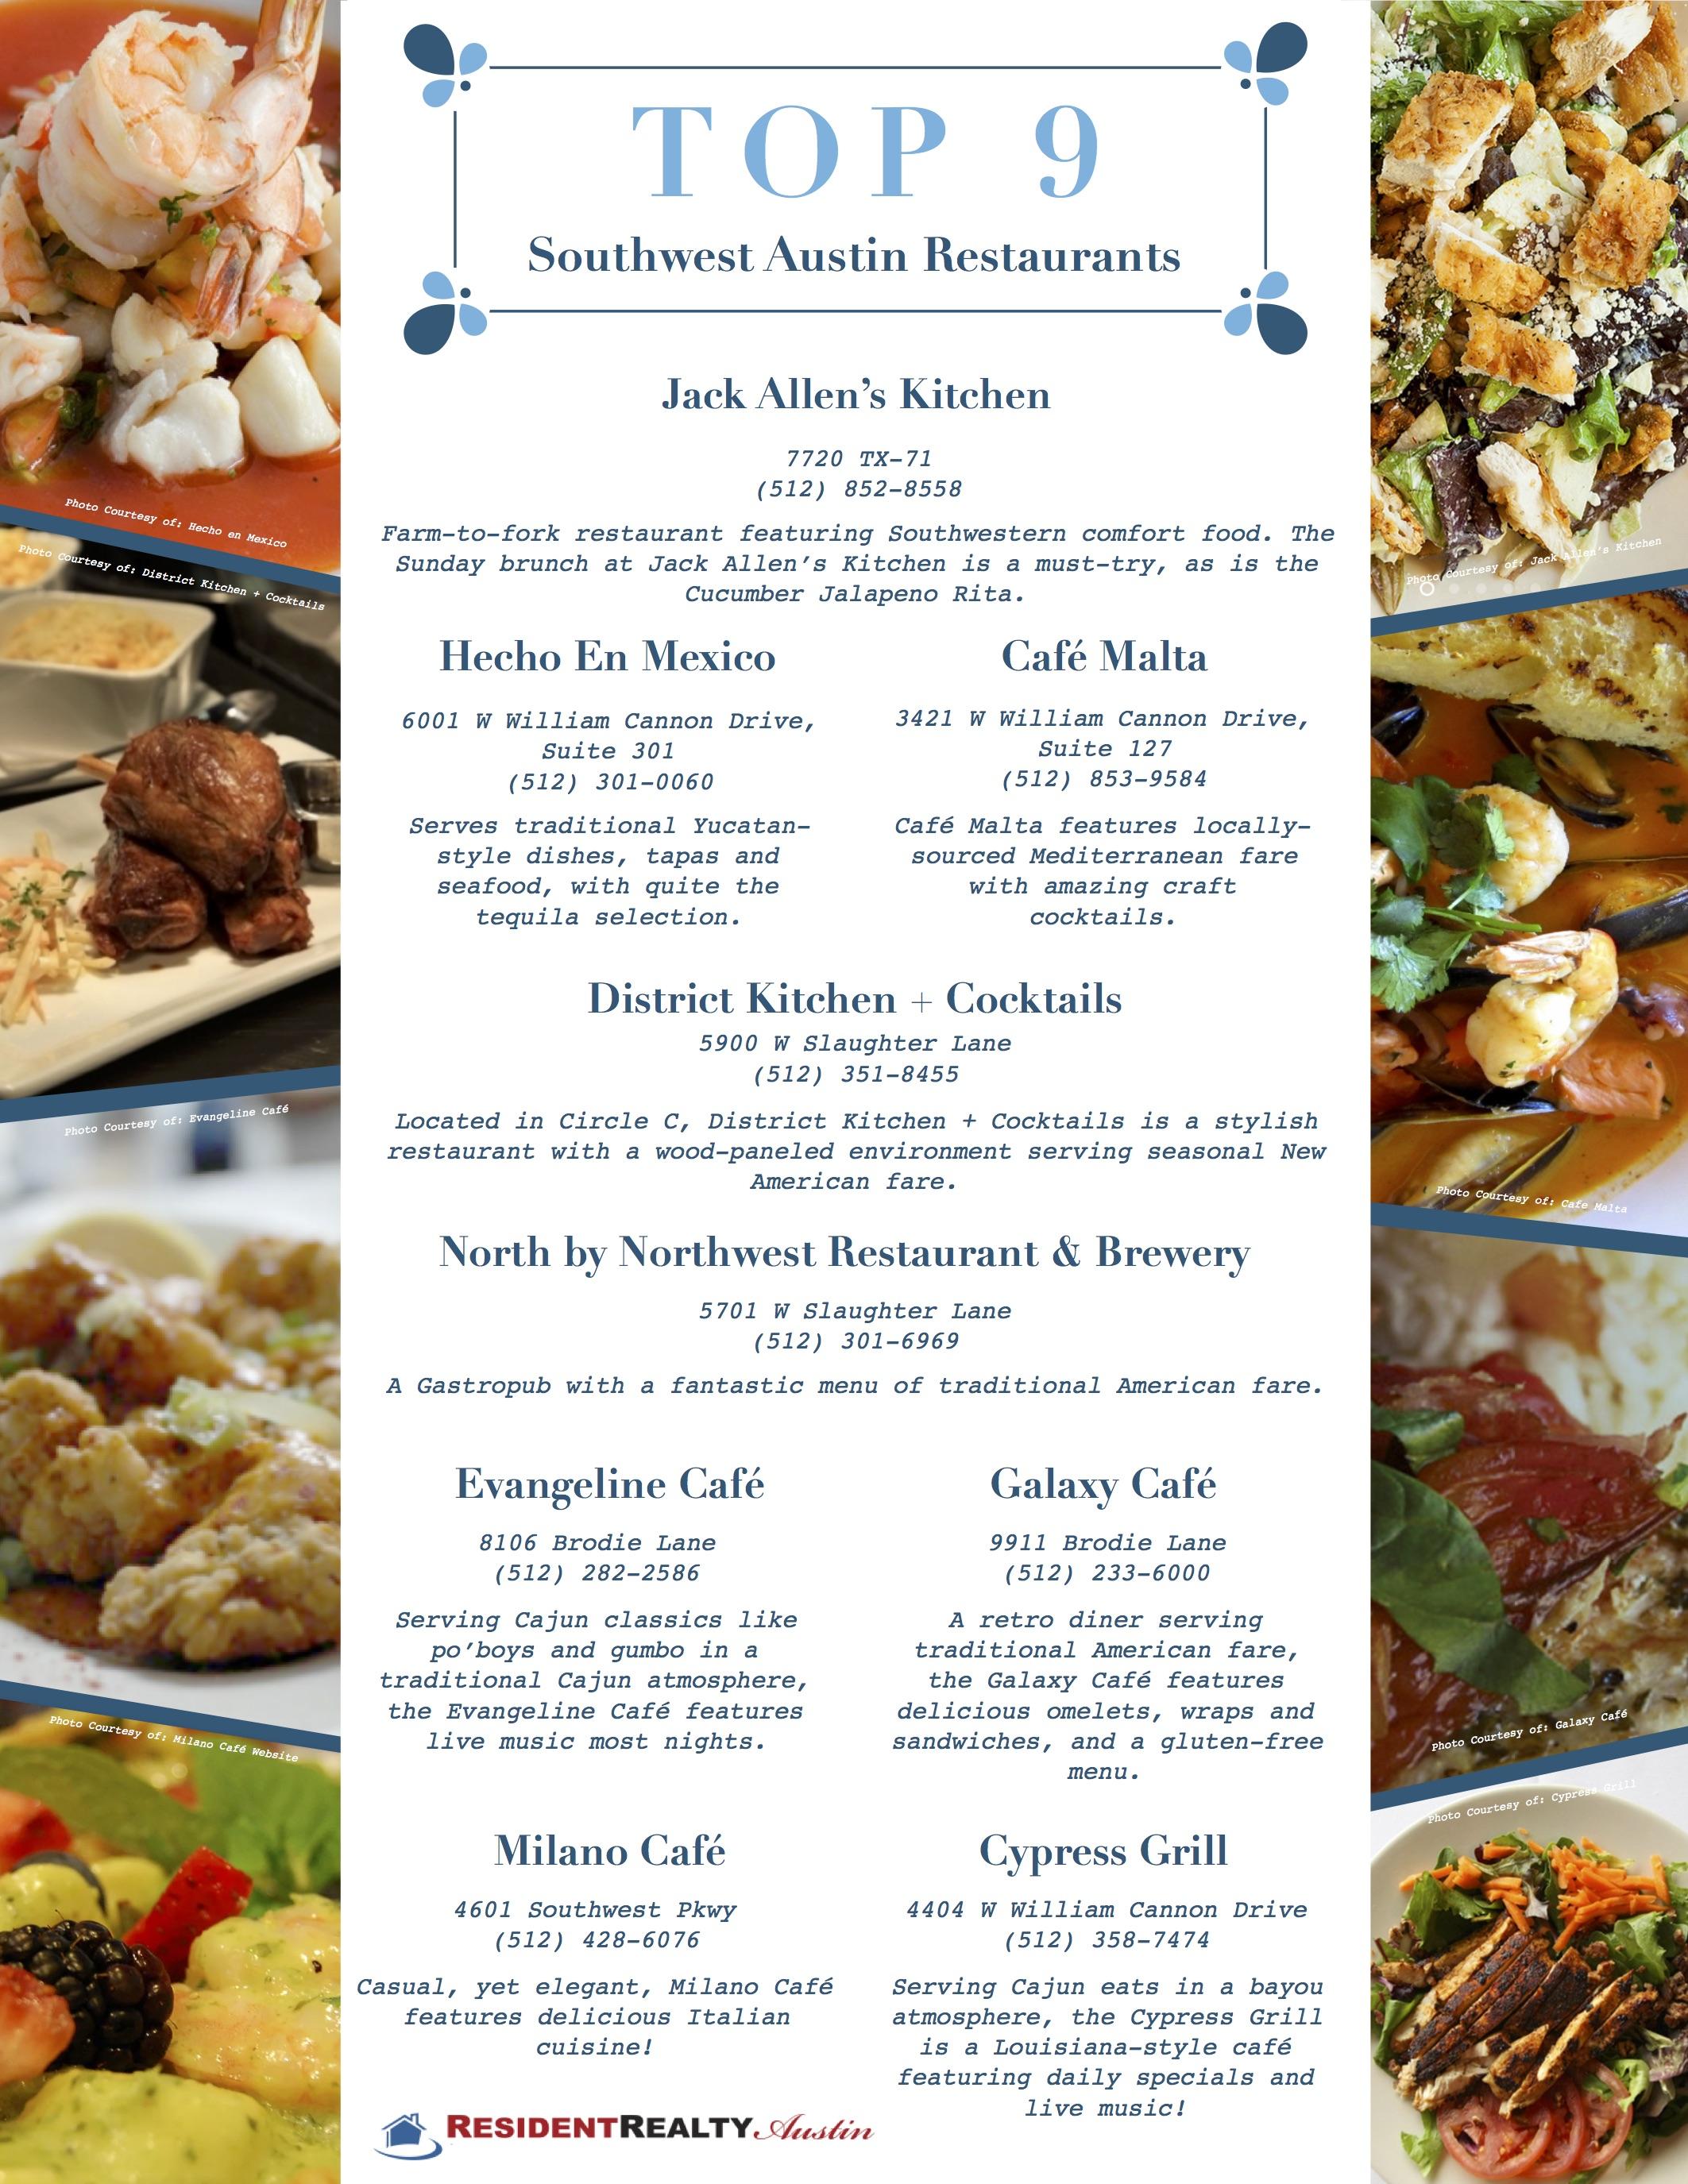 Top 9 Southwest Austin Restaurants